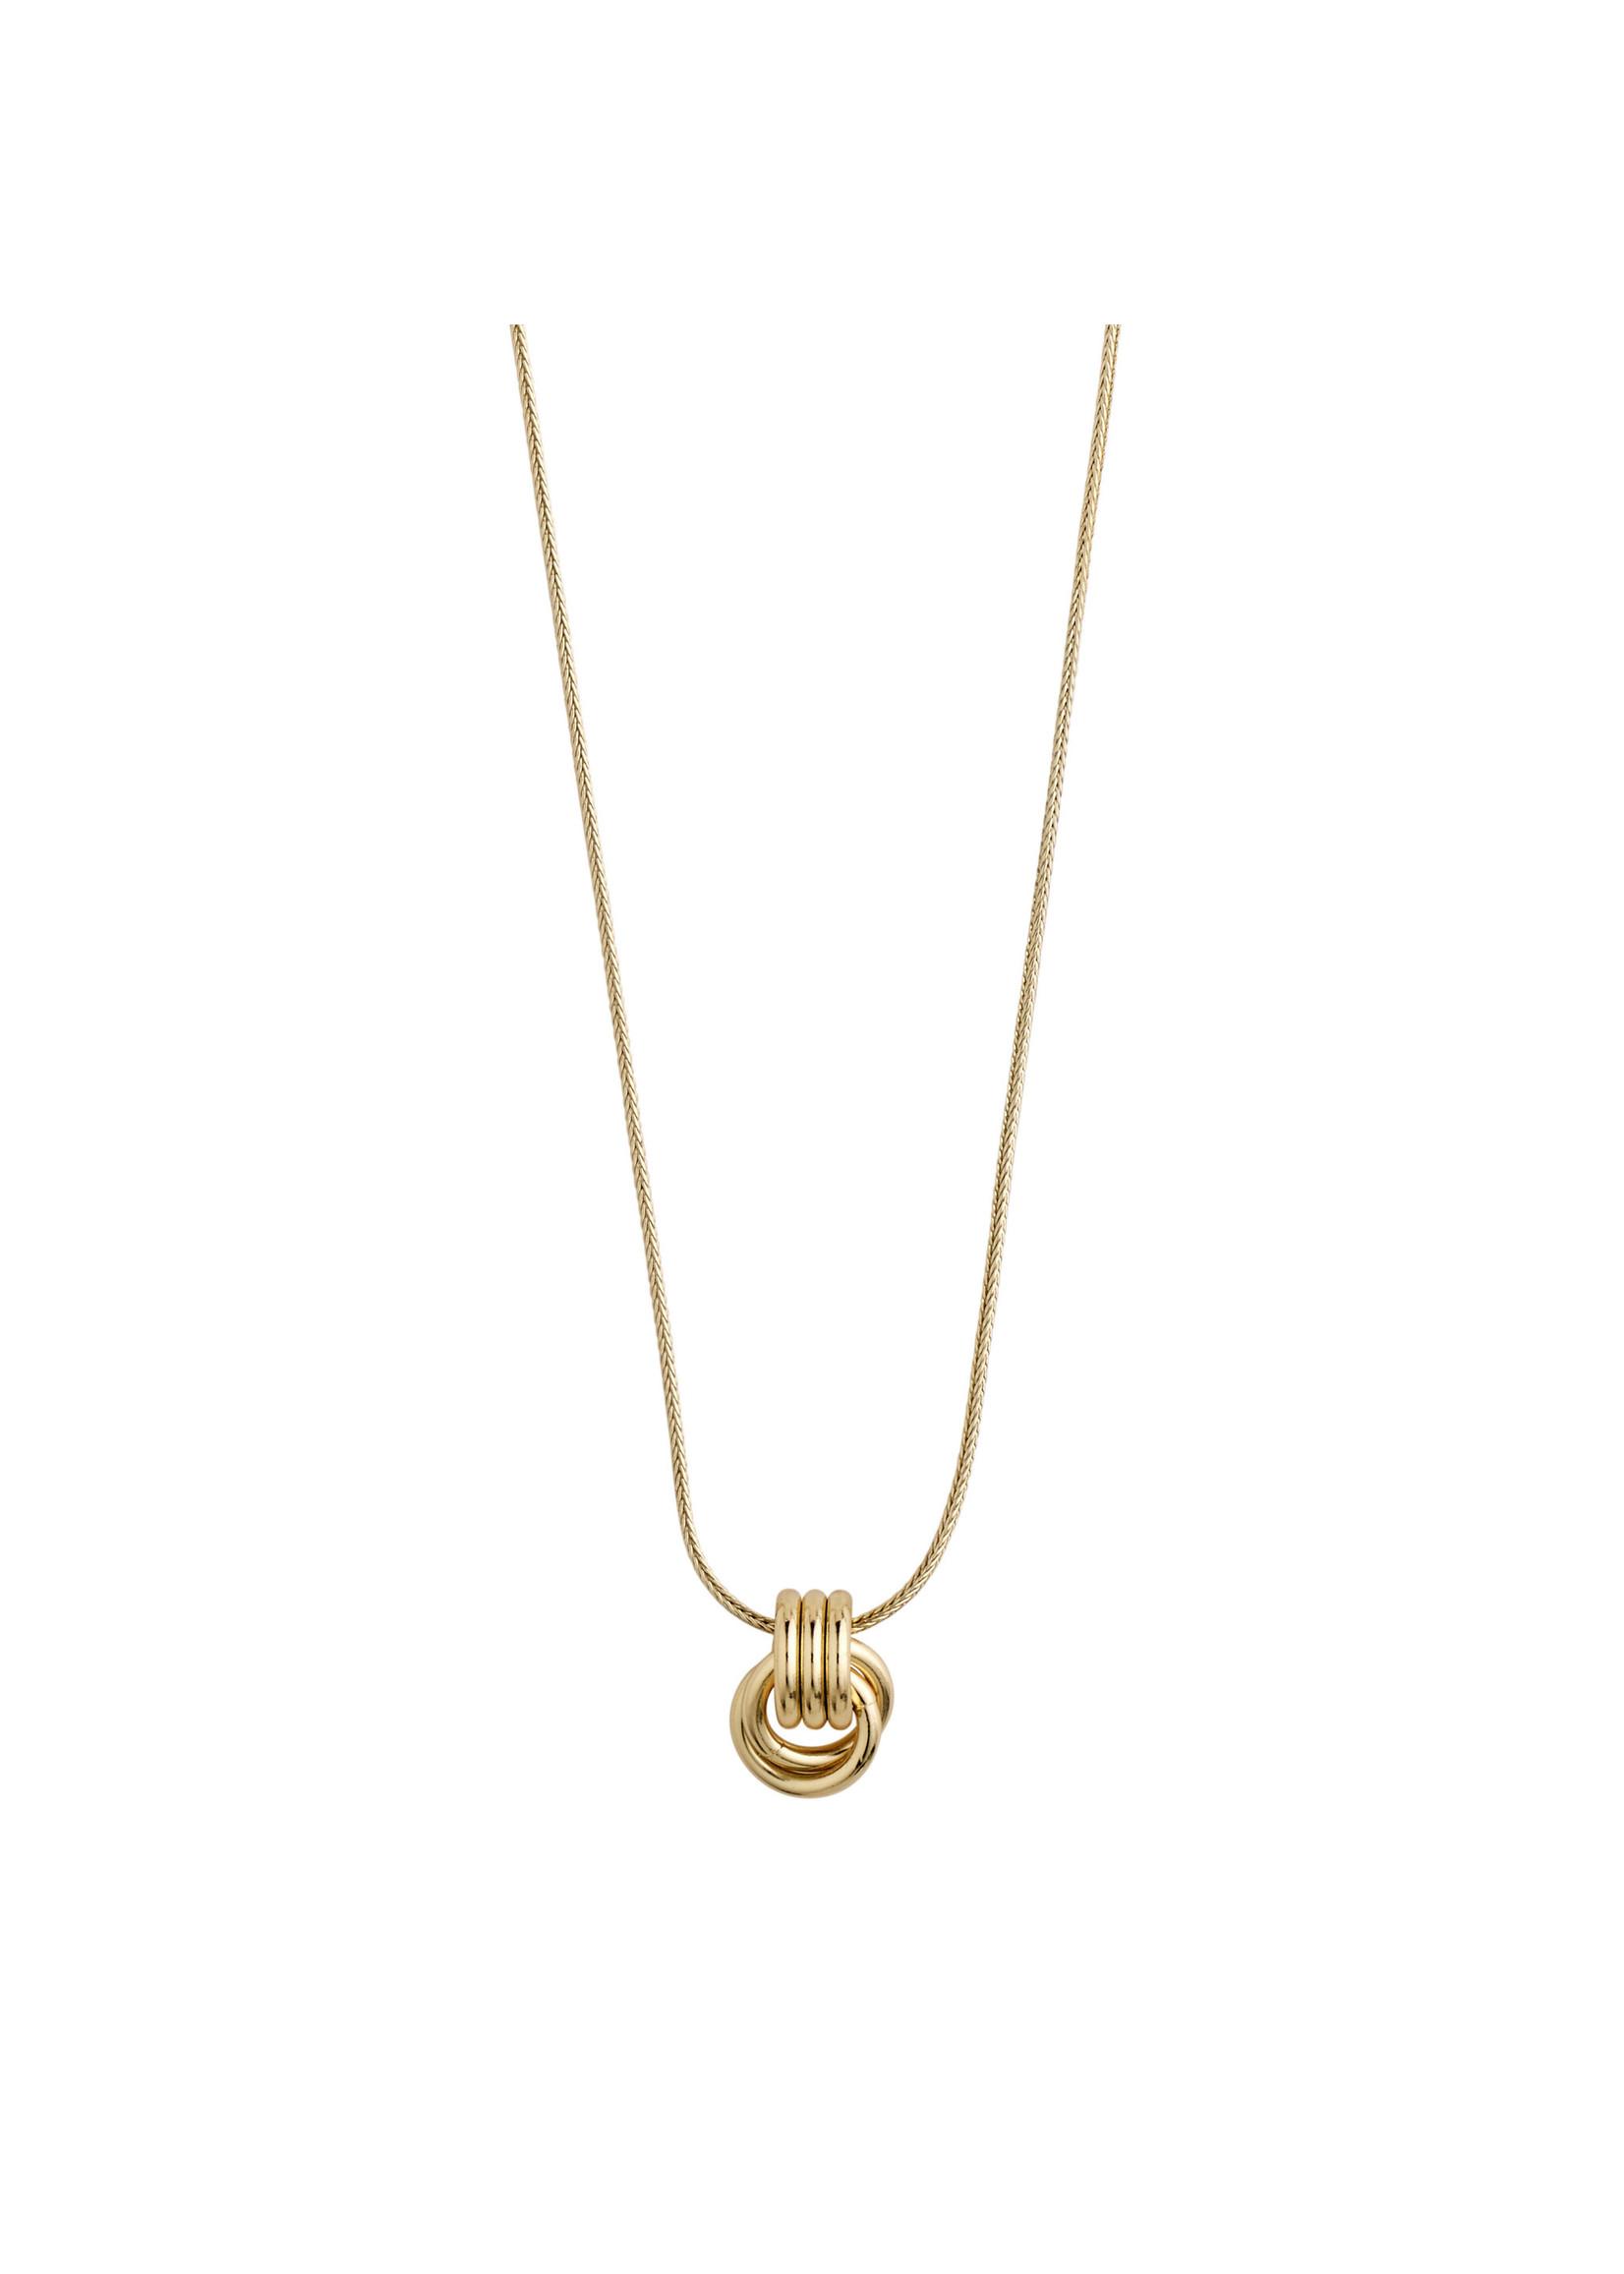 Pilgrim Jewellery Doris Necklace - Gold